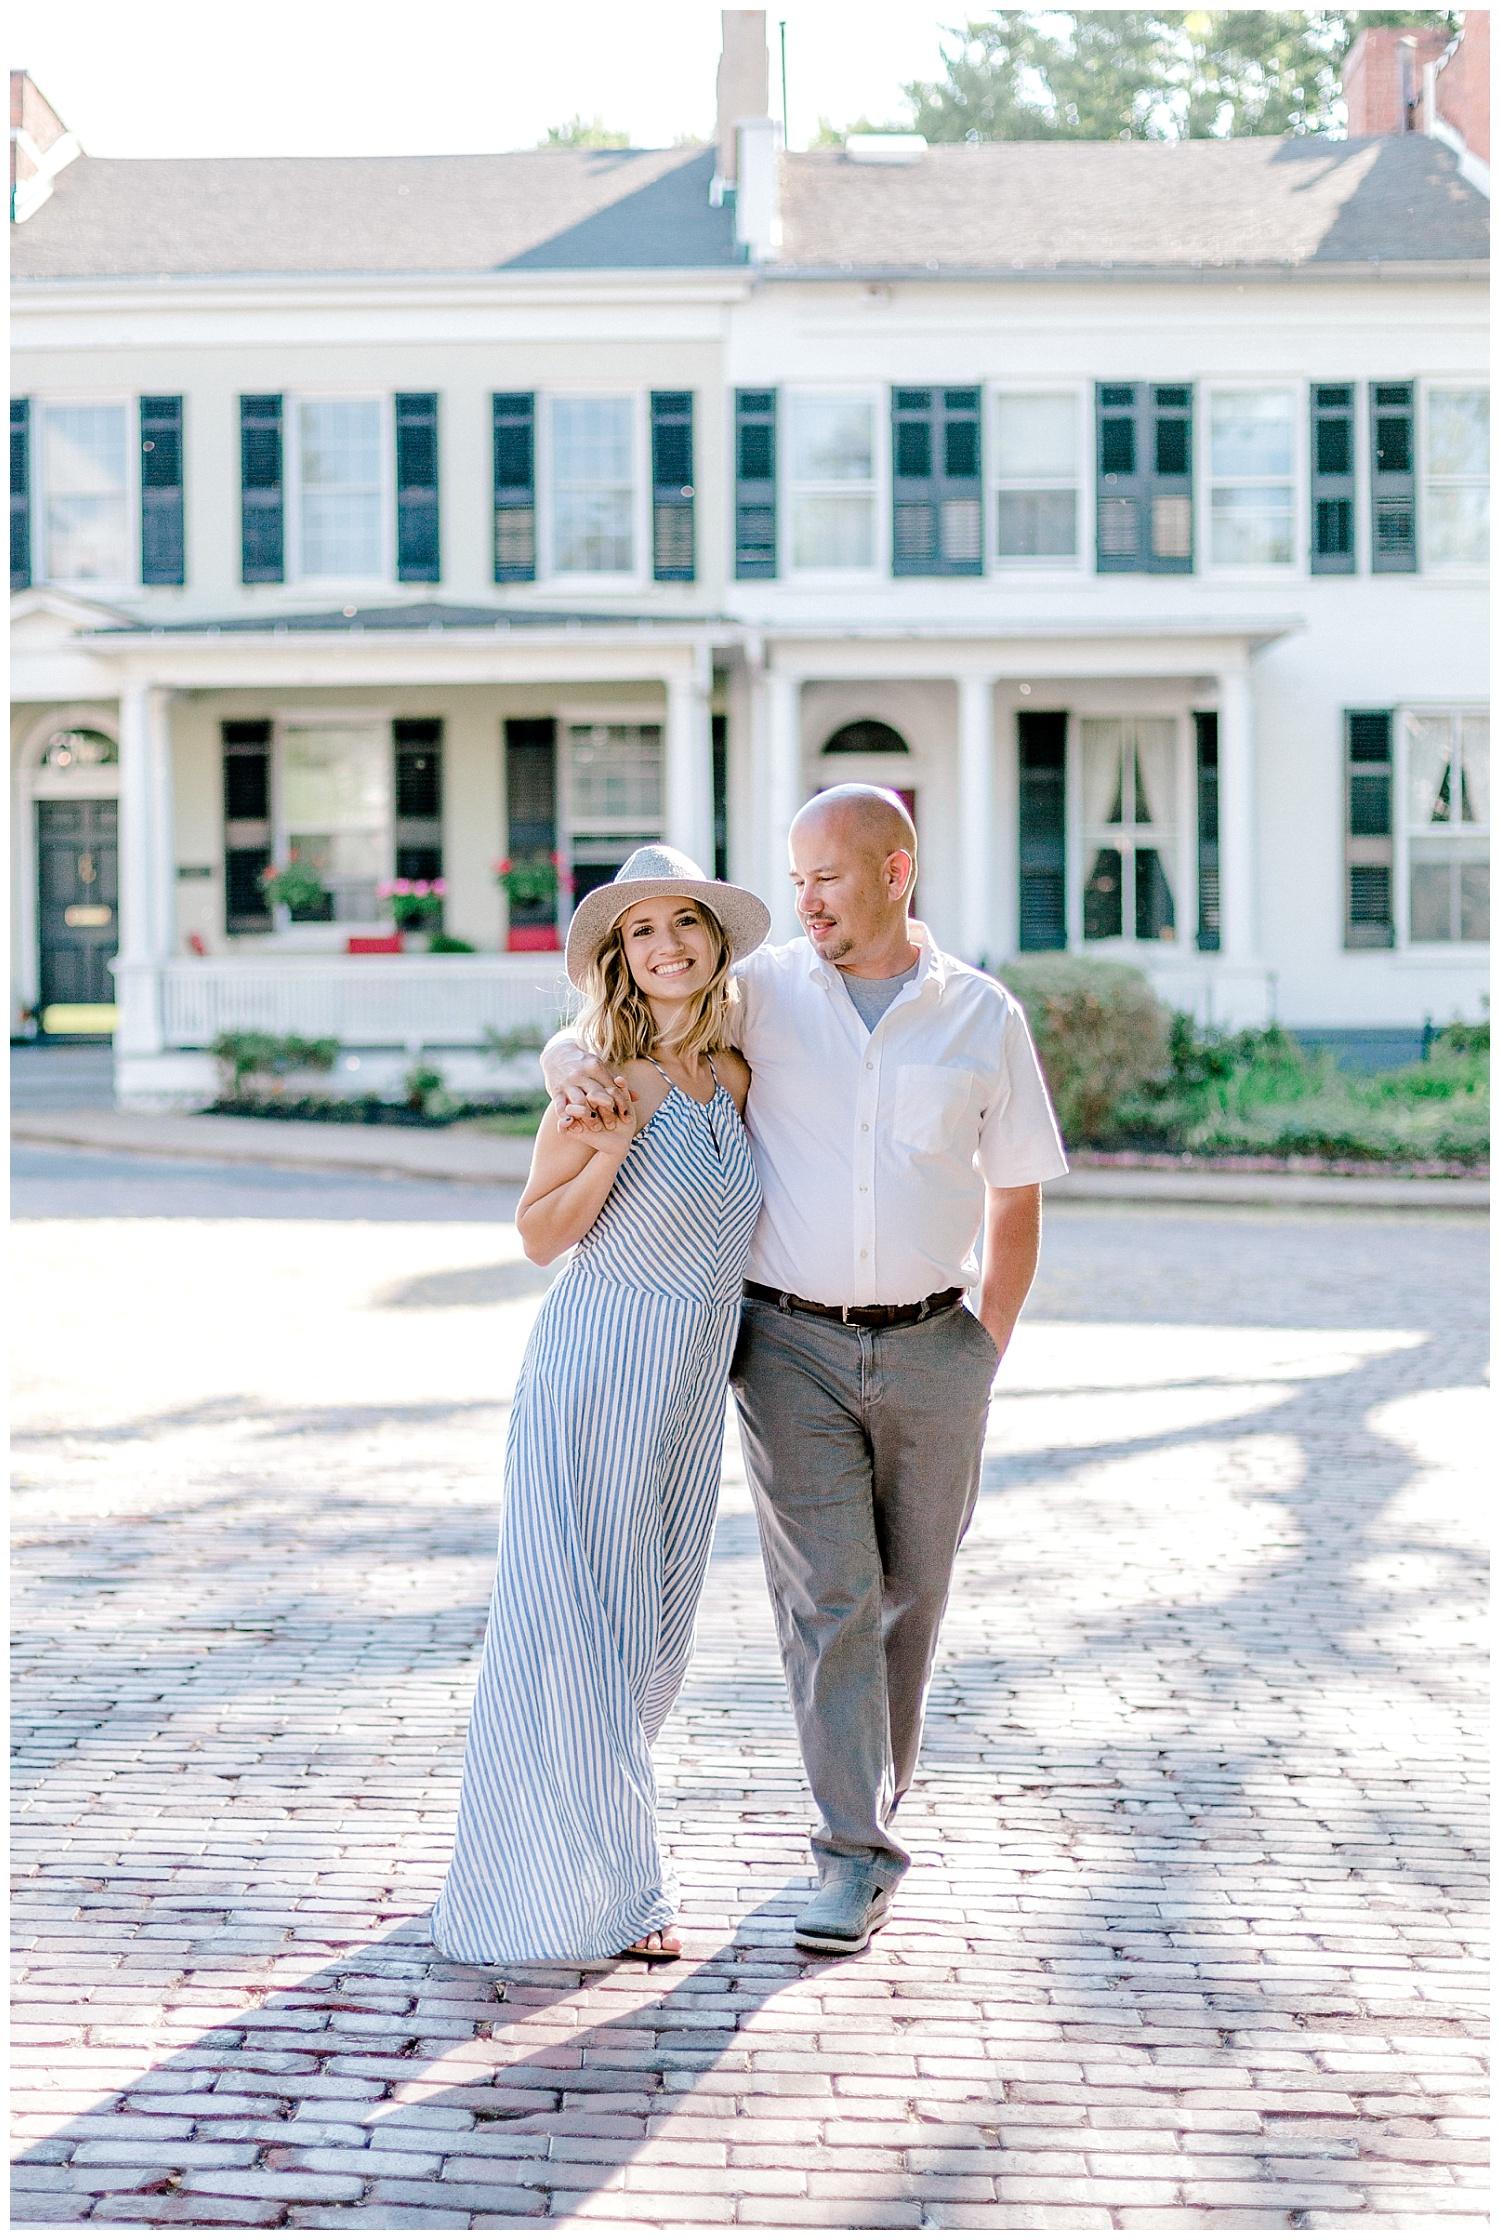 charleston south carolina inspired couples session in geneva new york by Pennsylvania based destination wedding and lifestyle photographer lytle photography_0007.jpg